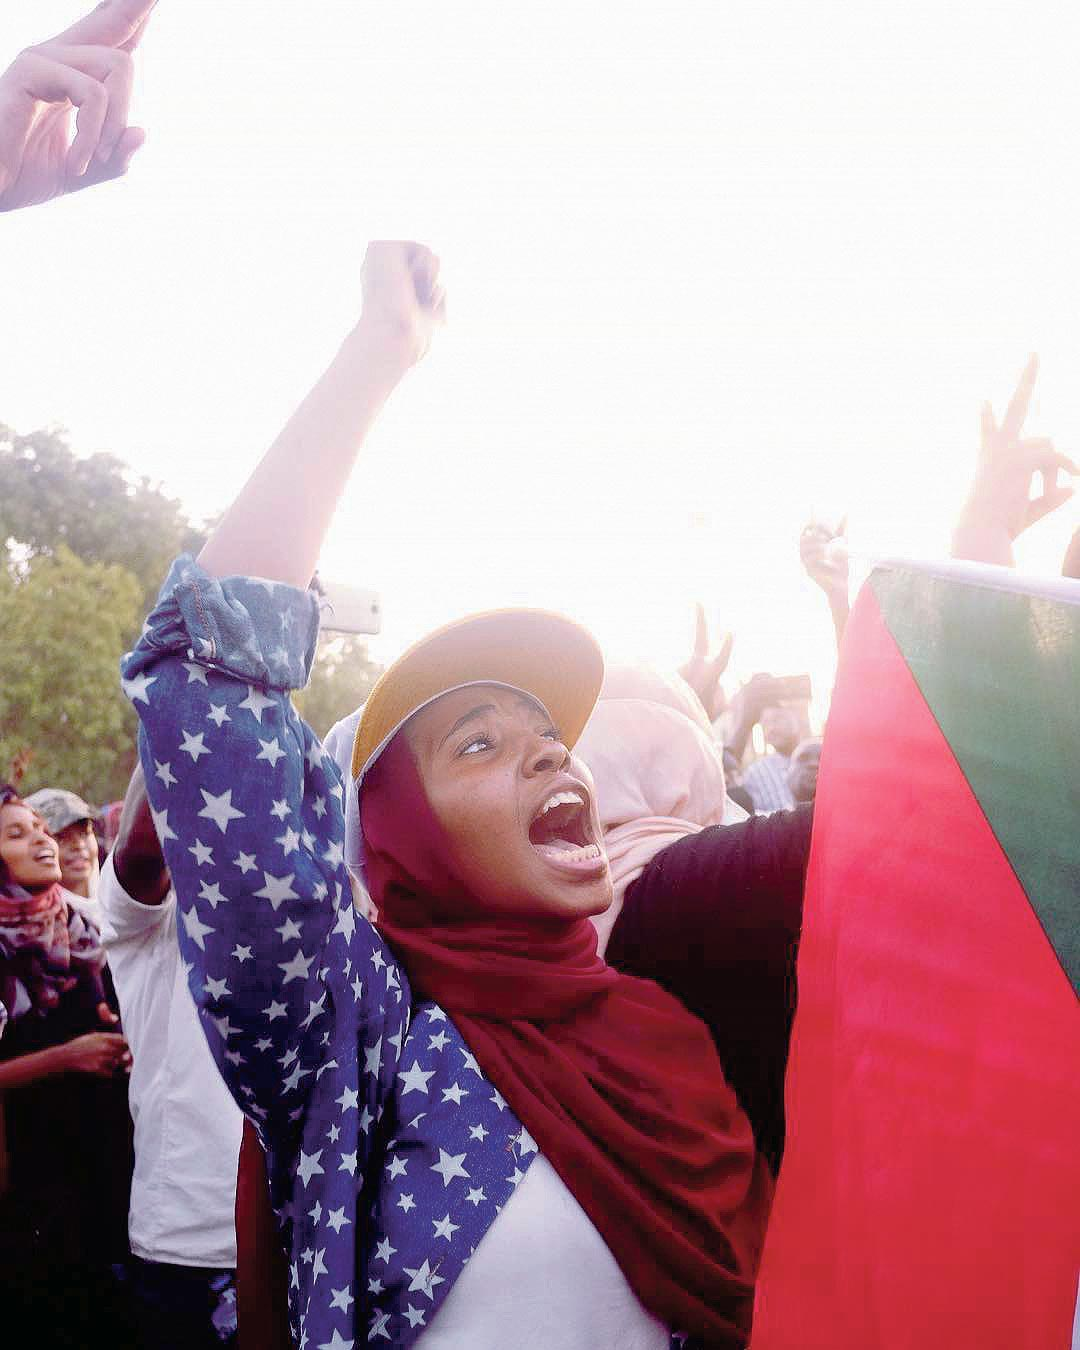 Manifestation à Khartoum. Photo: Ola Alsheikh Photography